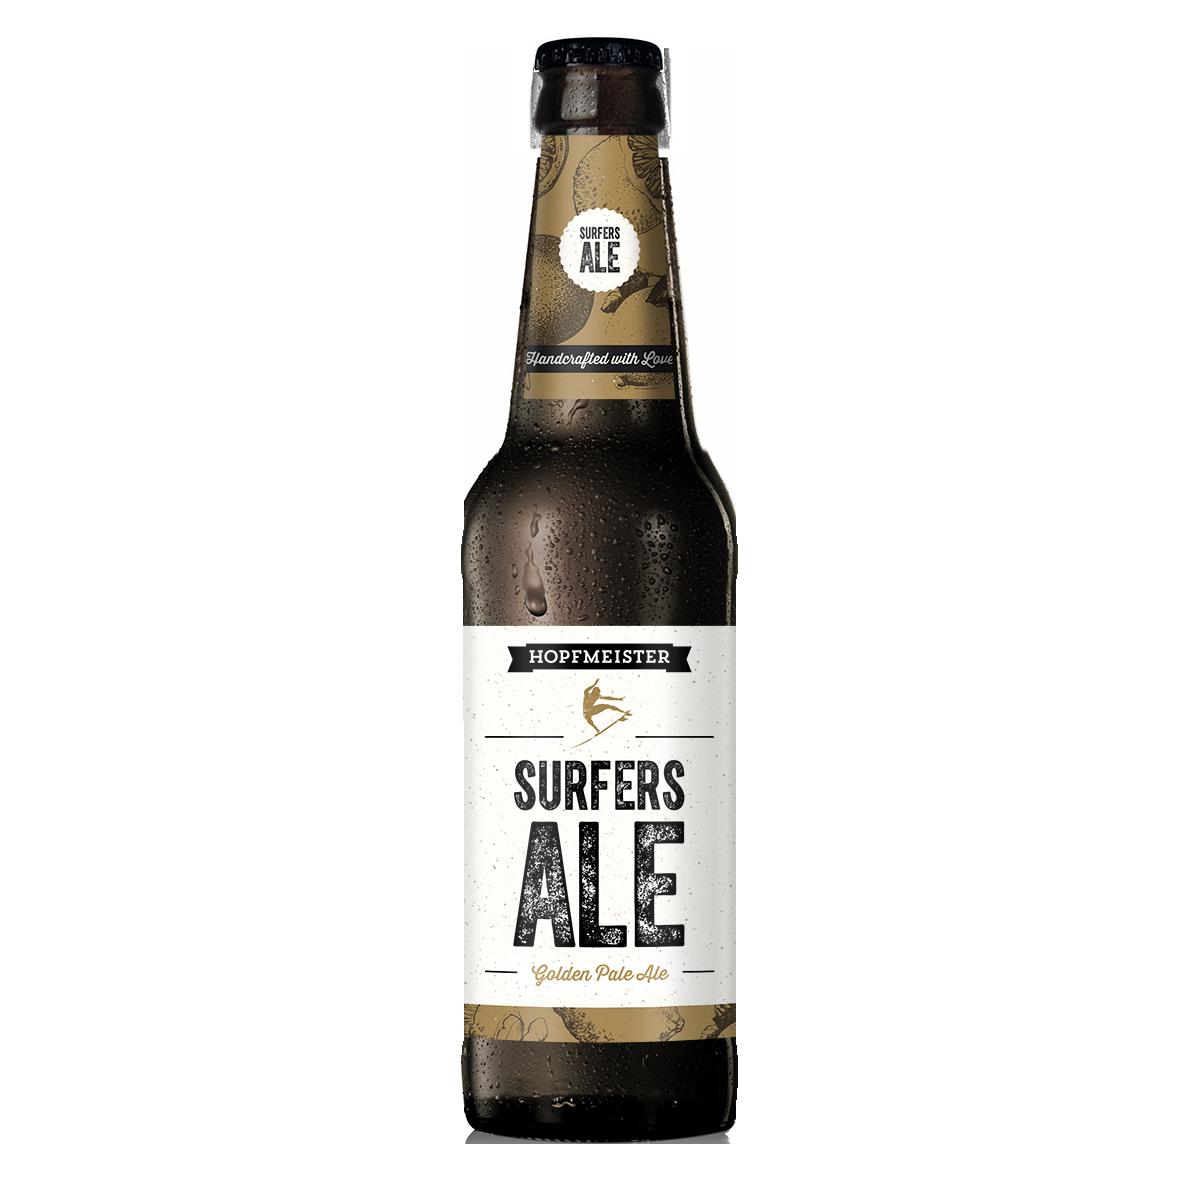 Hopfmeister Surfers Ale